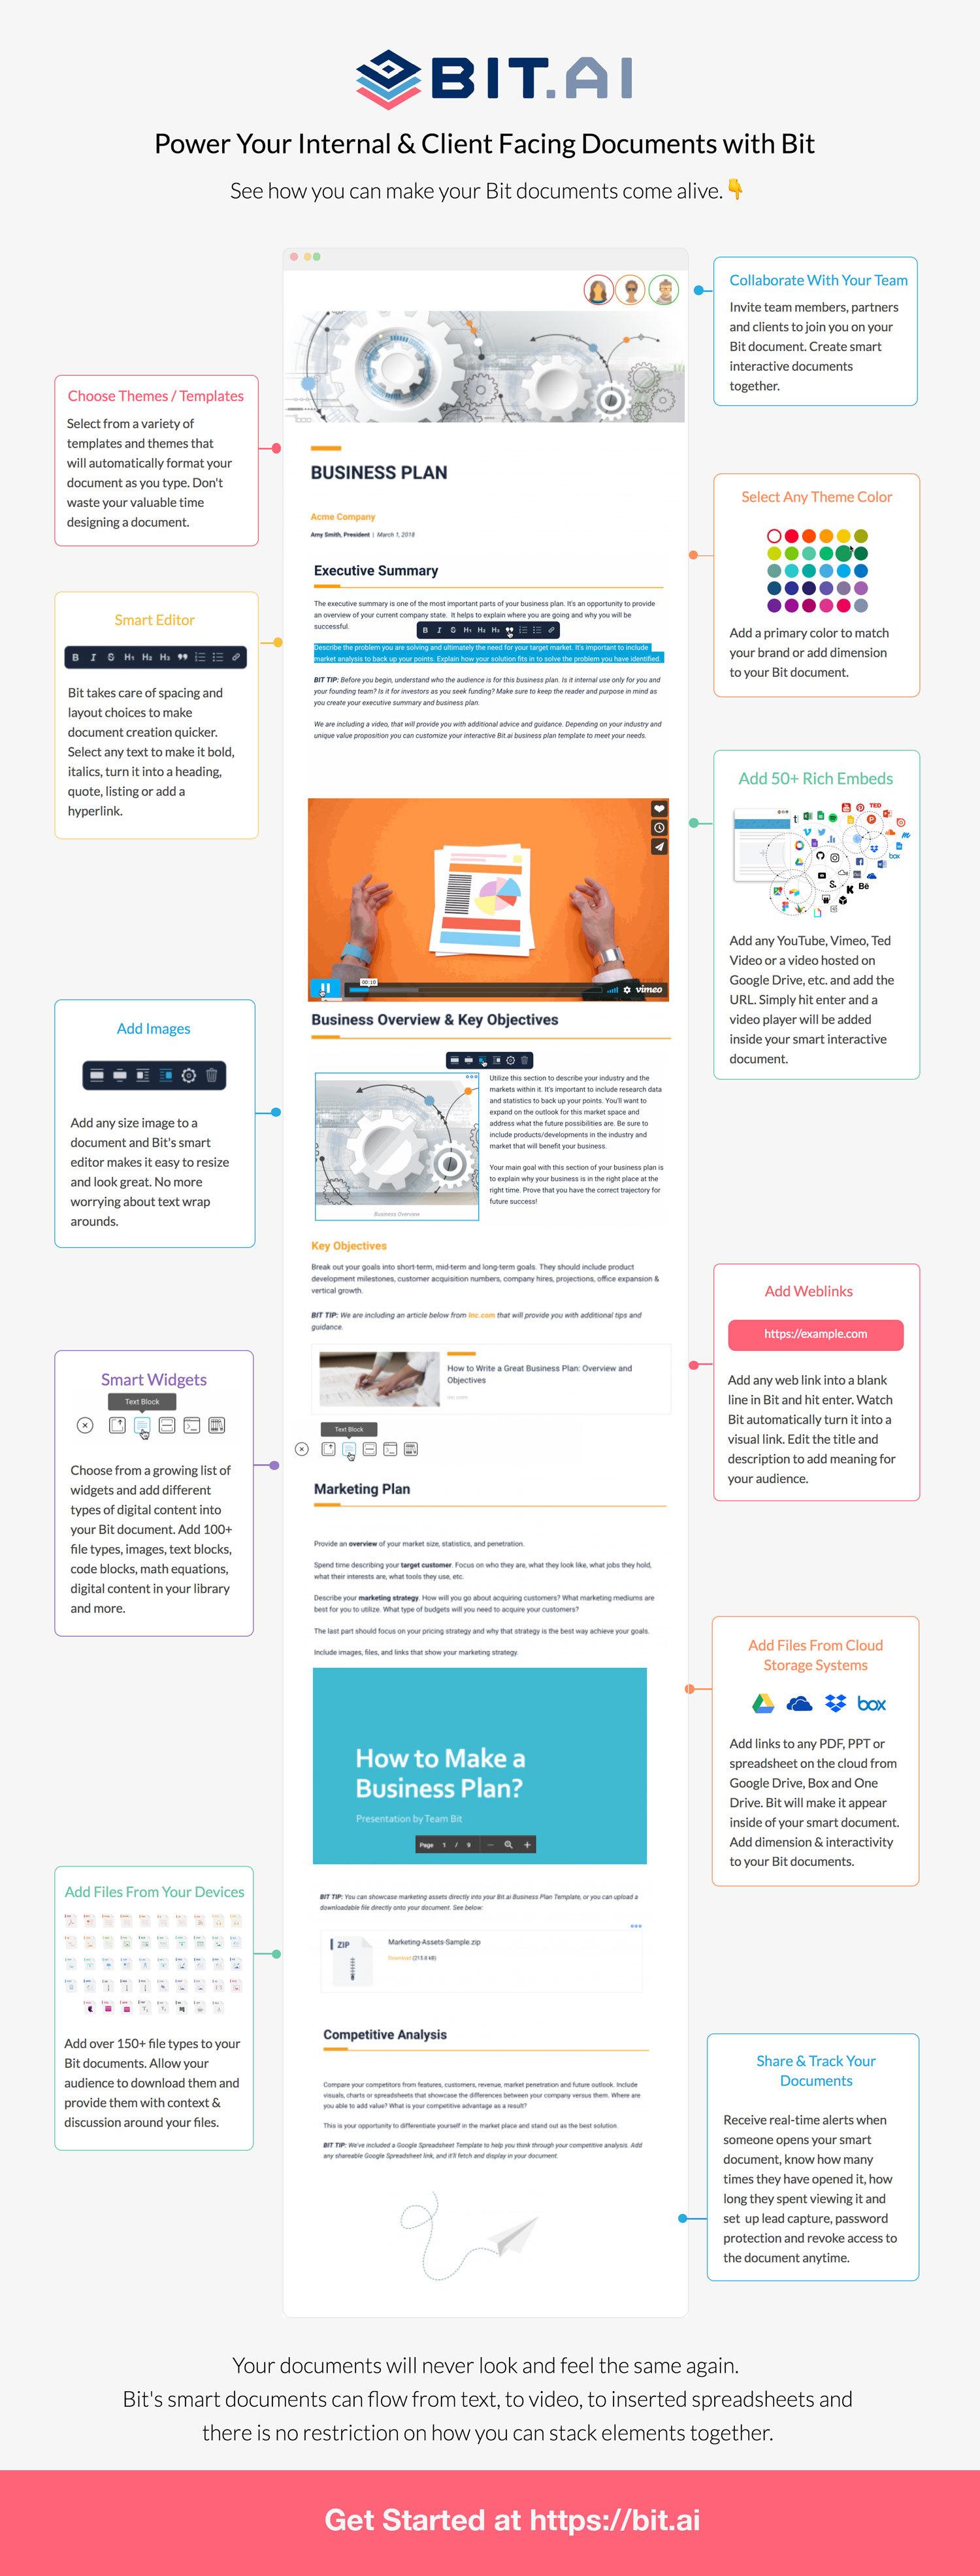 Benefits of Bit.ai collaboration tool